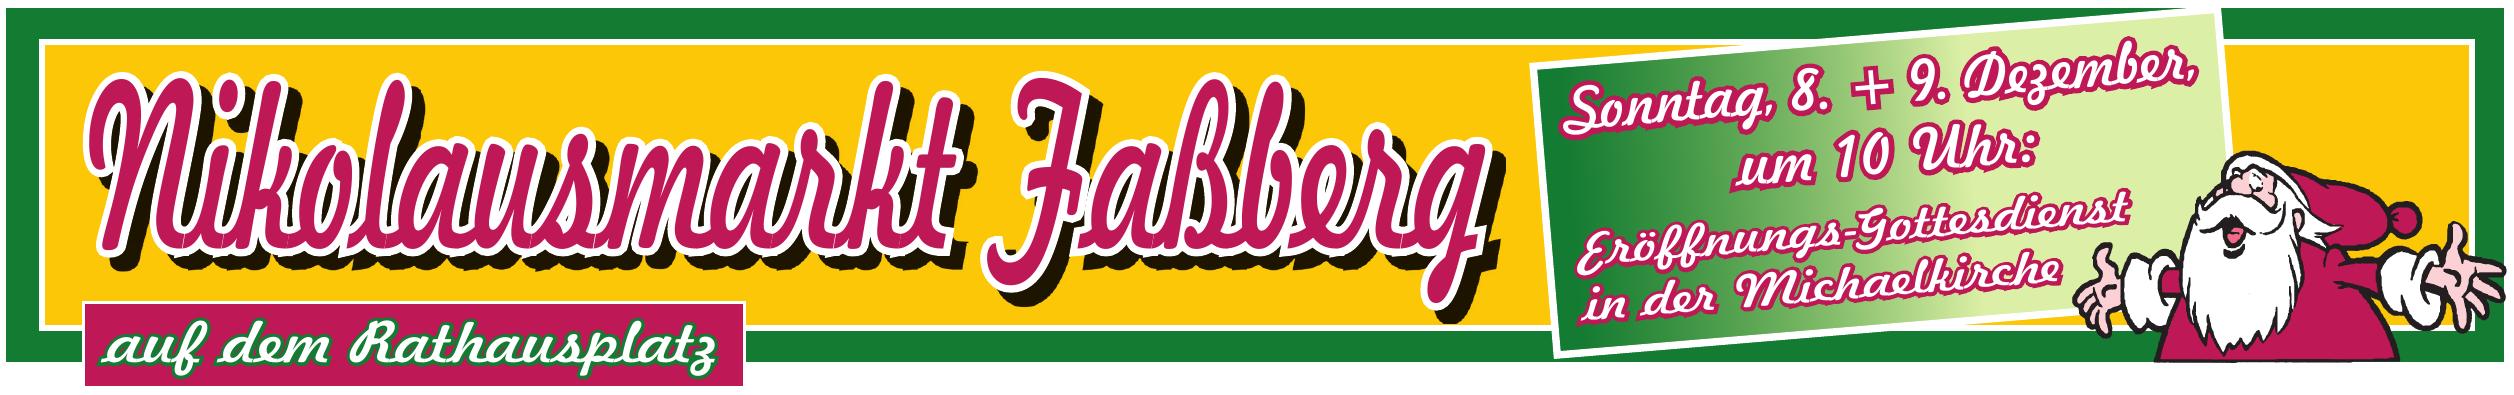 Nikolausmarkt Faßberg Image 1